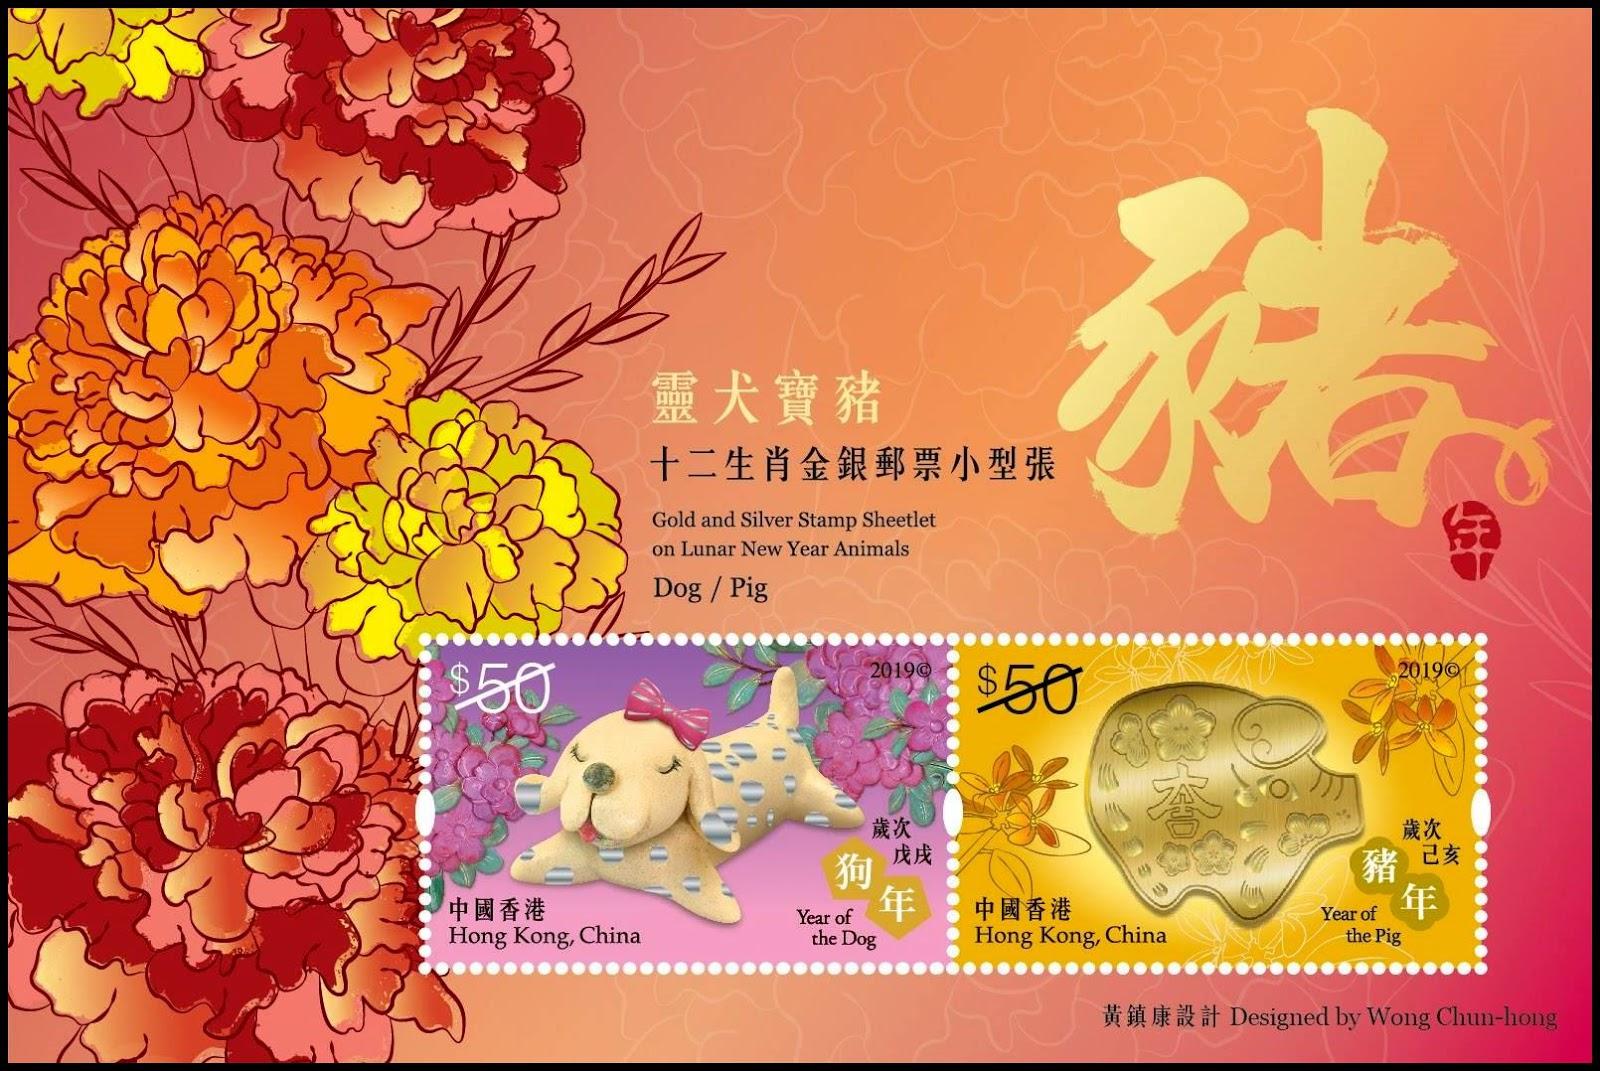 Hong Kong - Lunar New Year Animals (January 12, 2019) souvenir sheet - dog, pig